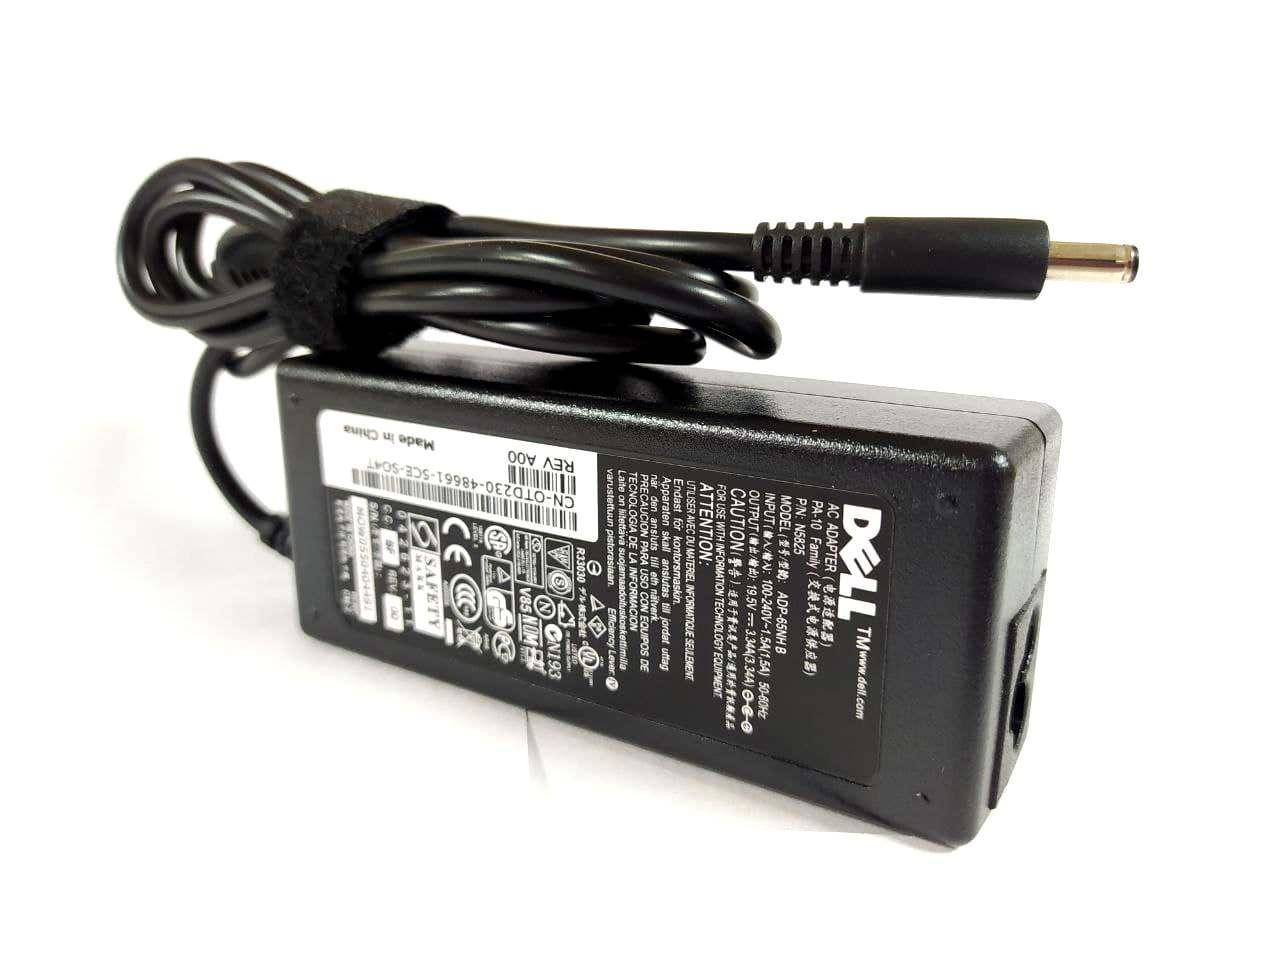 Блок питания к ноутбуку Dell Inspiron 15 7568 65W 19.5V 3.34A 4.5*3.0mm